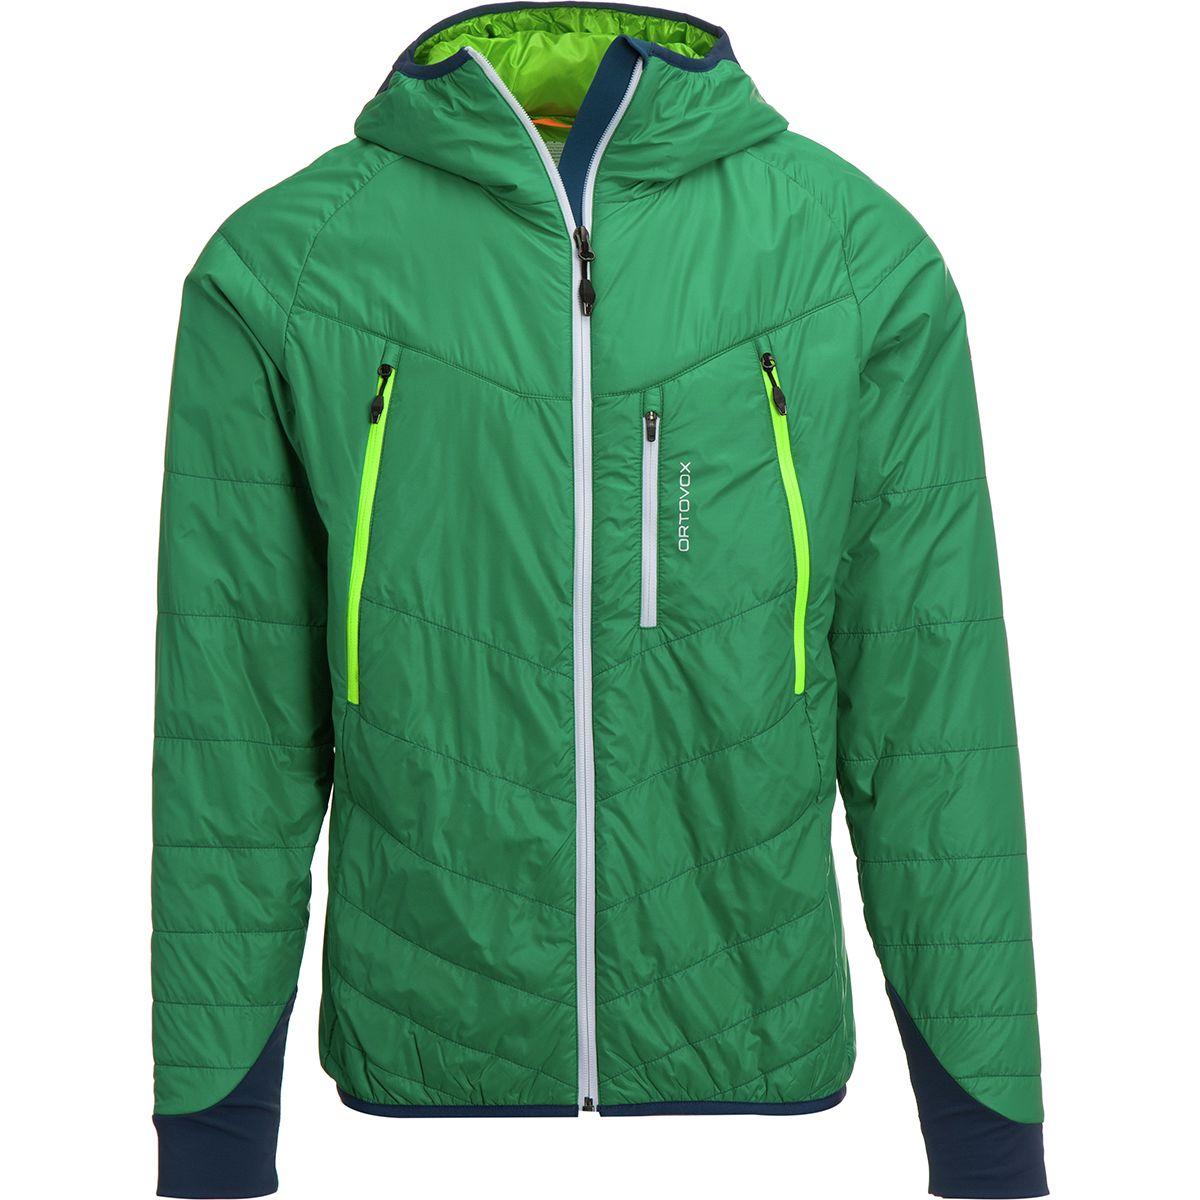 Ortovox  Piz Boe Light Tec Insulated Jacket